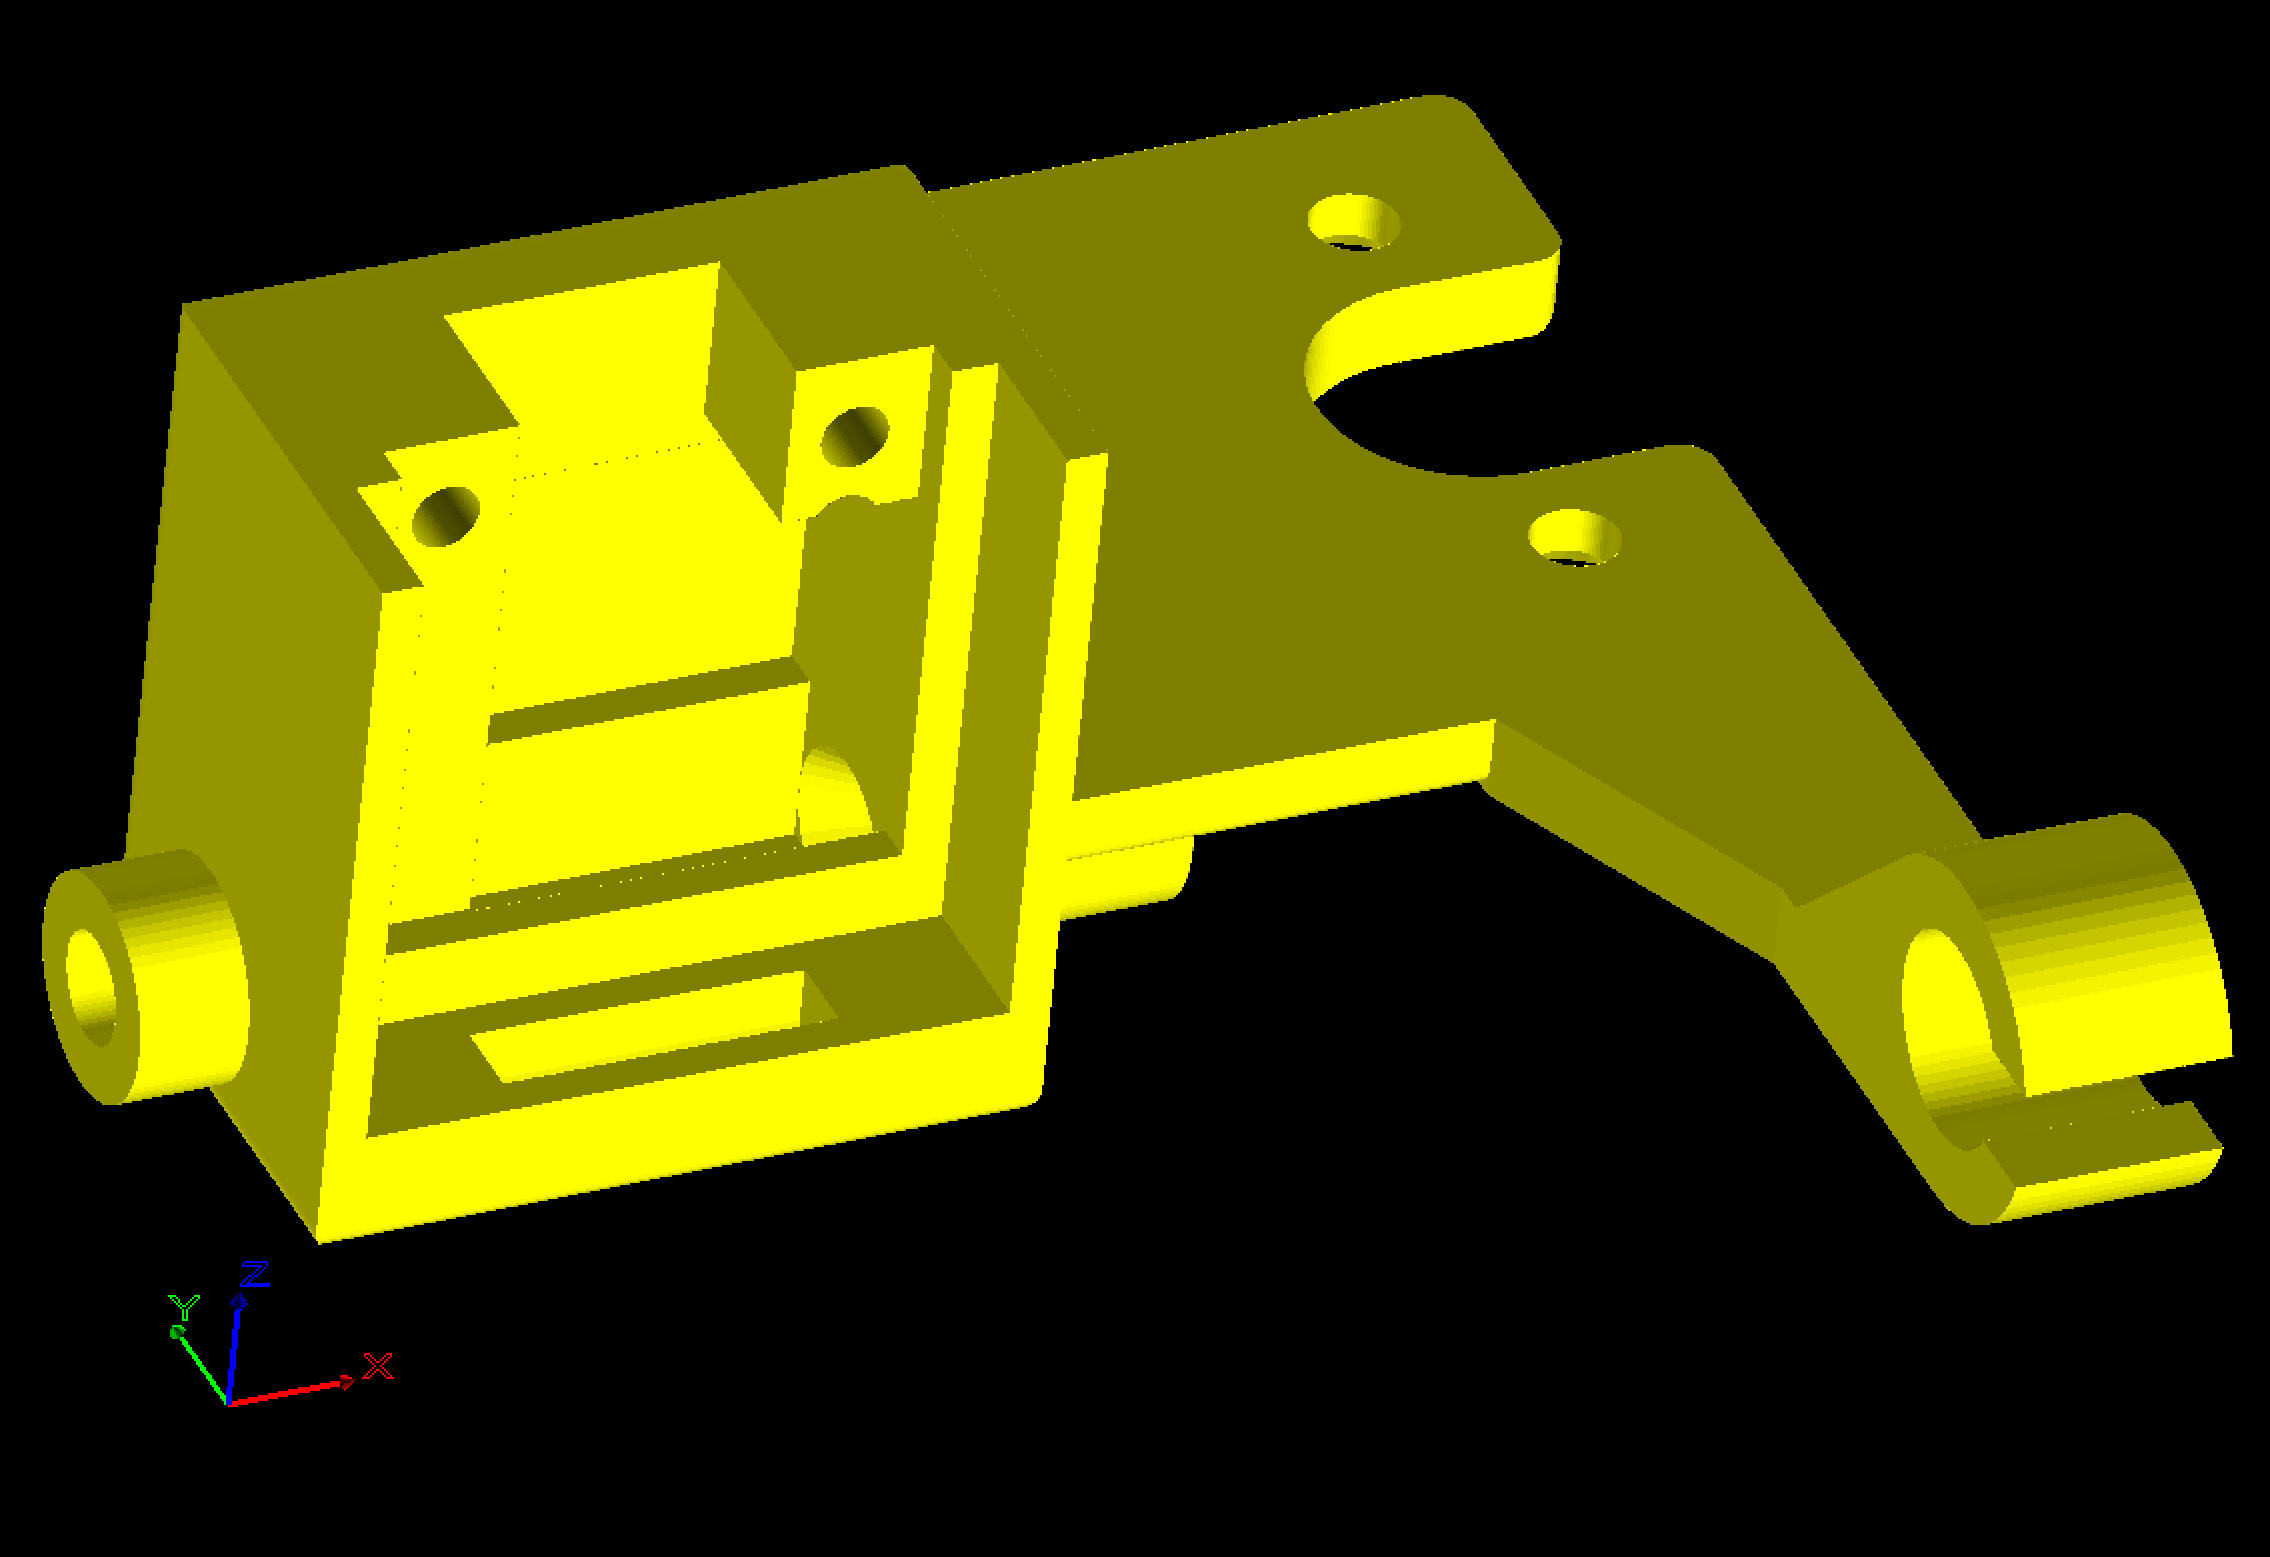 Cr 10 Filament Sensor Guide Cable Strain Relief By Blankman